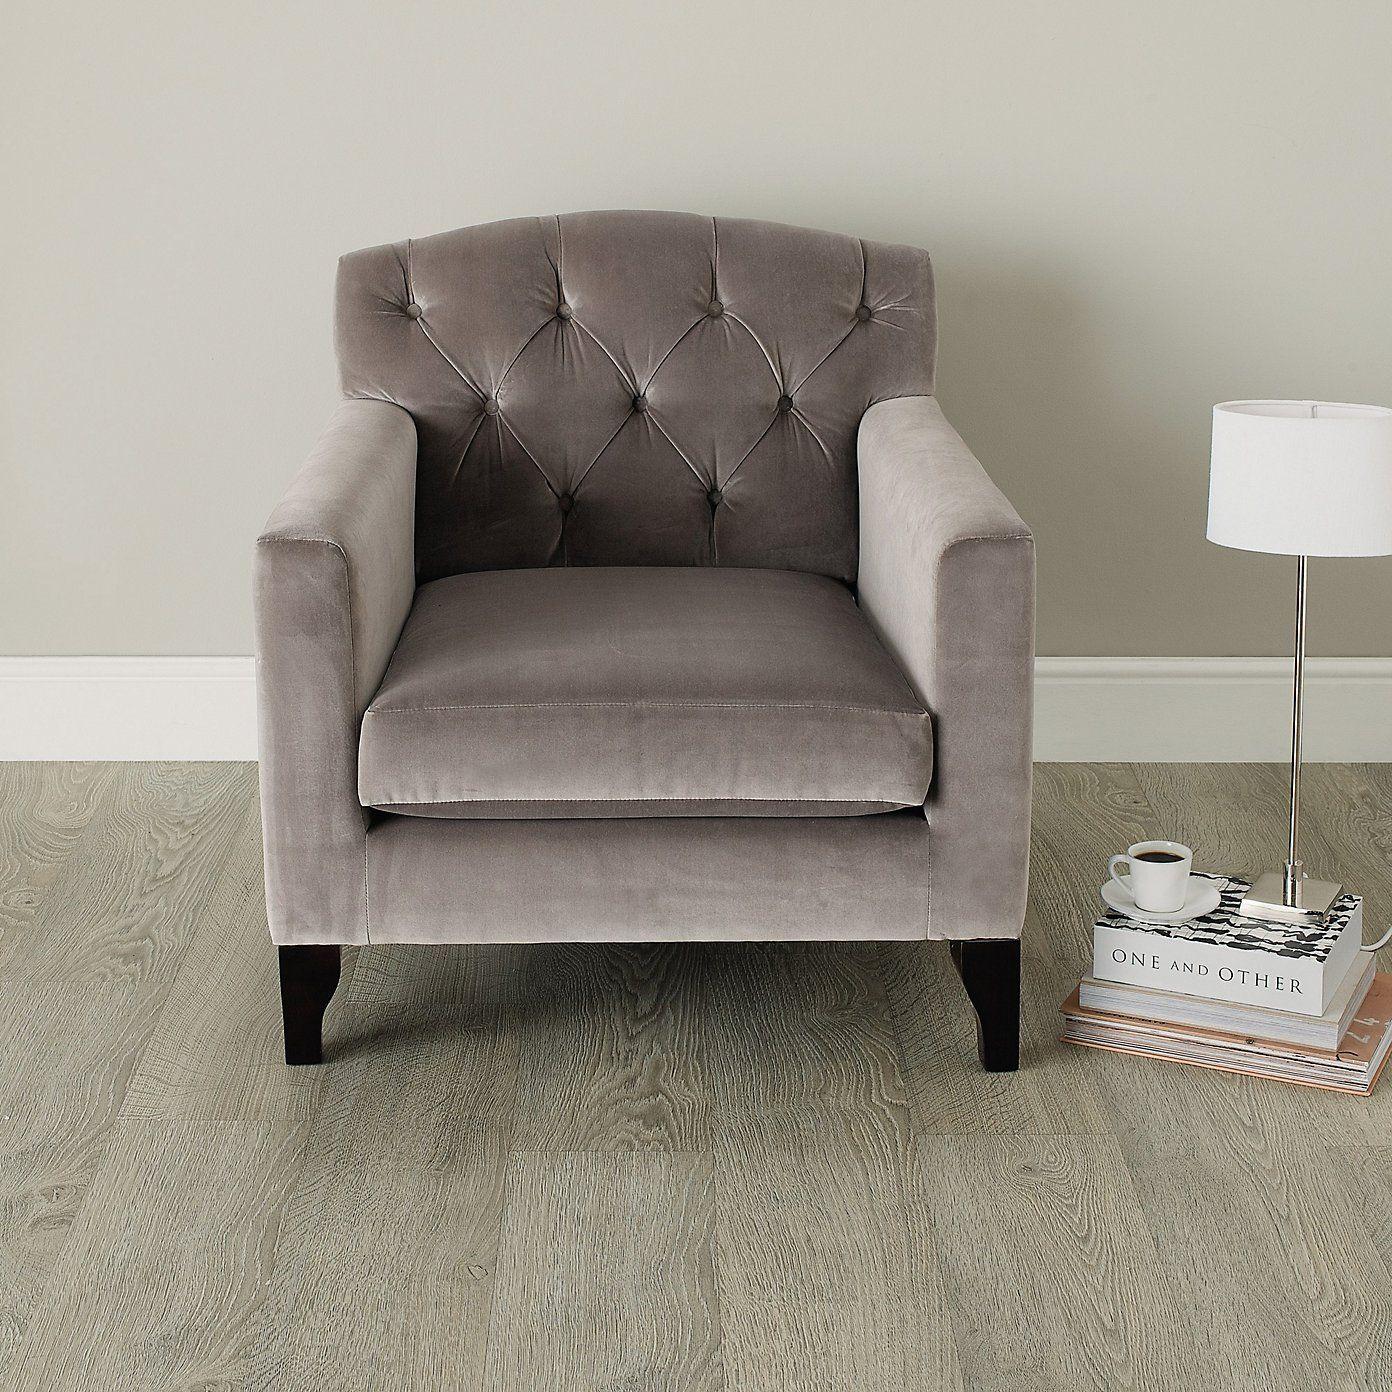 Eaton Armchair - Silver & Stone | The White Company ...